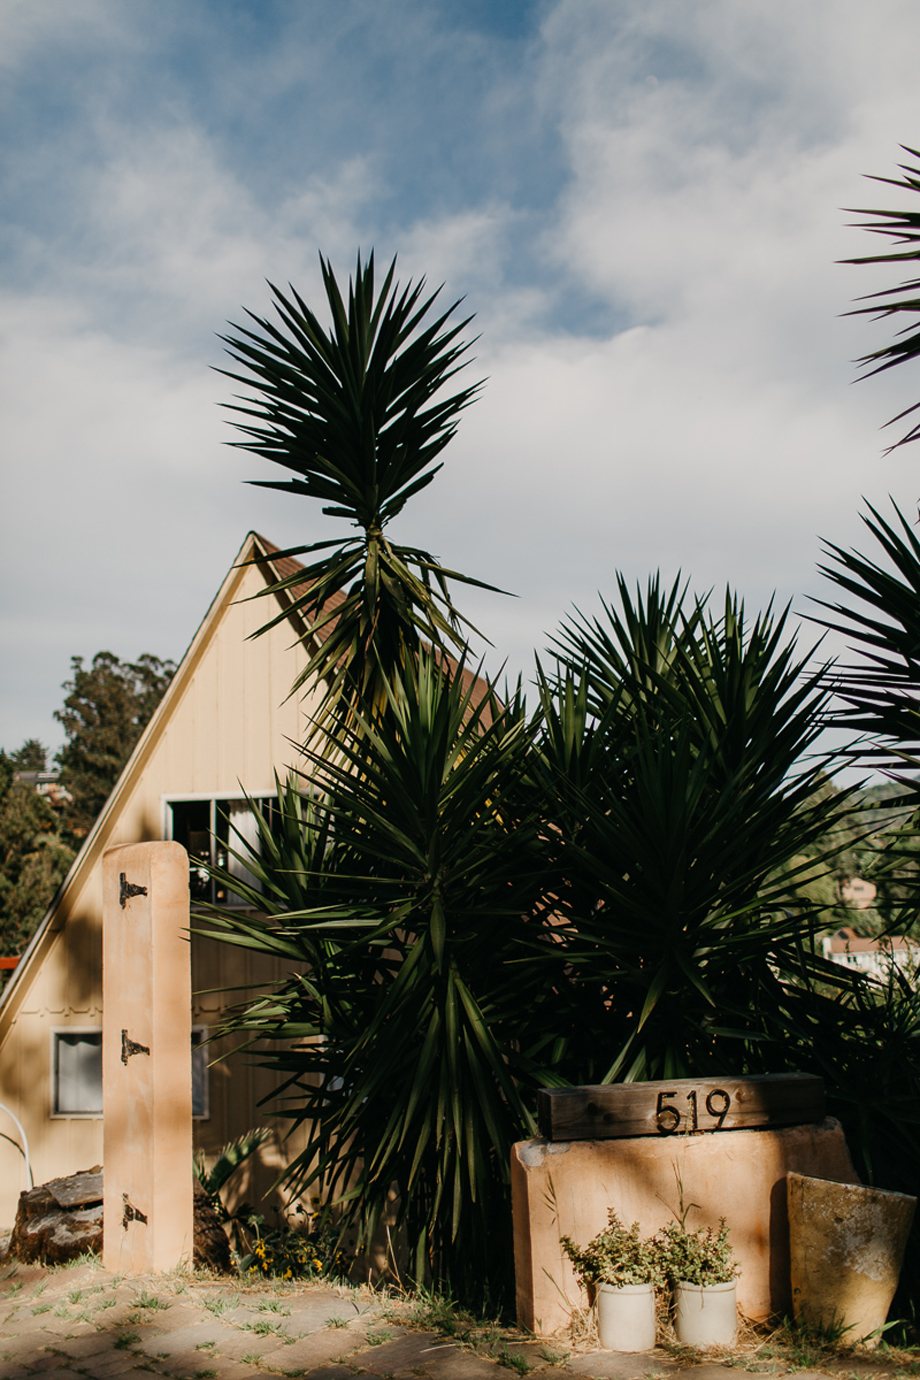 790-destination-wedding-photographer-san-francisco-california--the-livelys.jpg